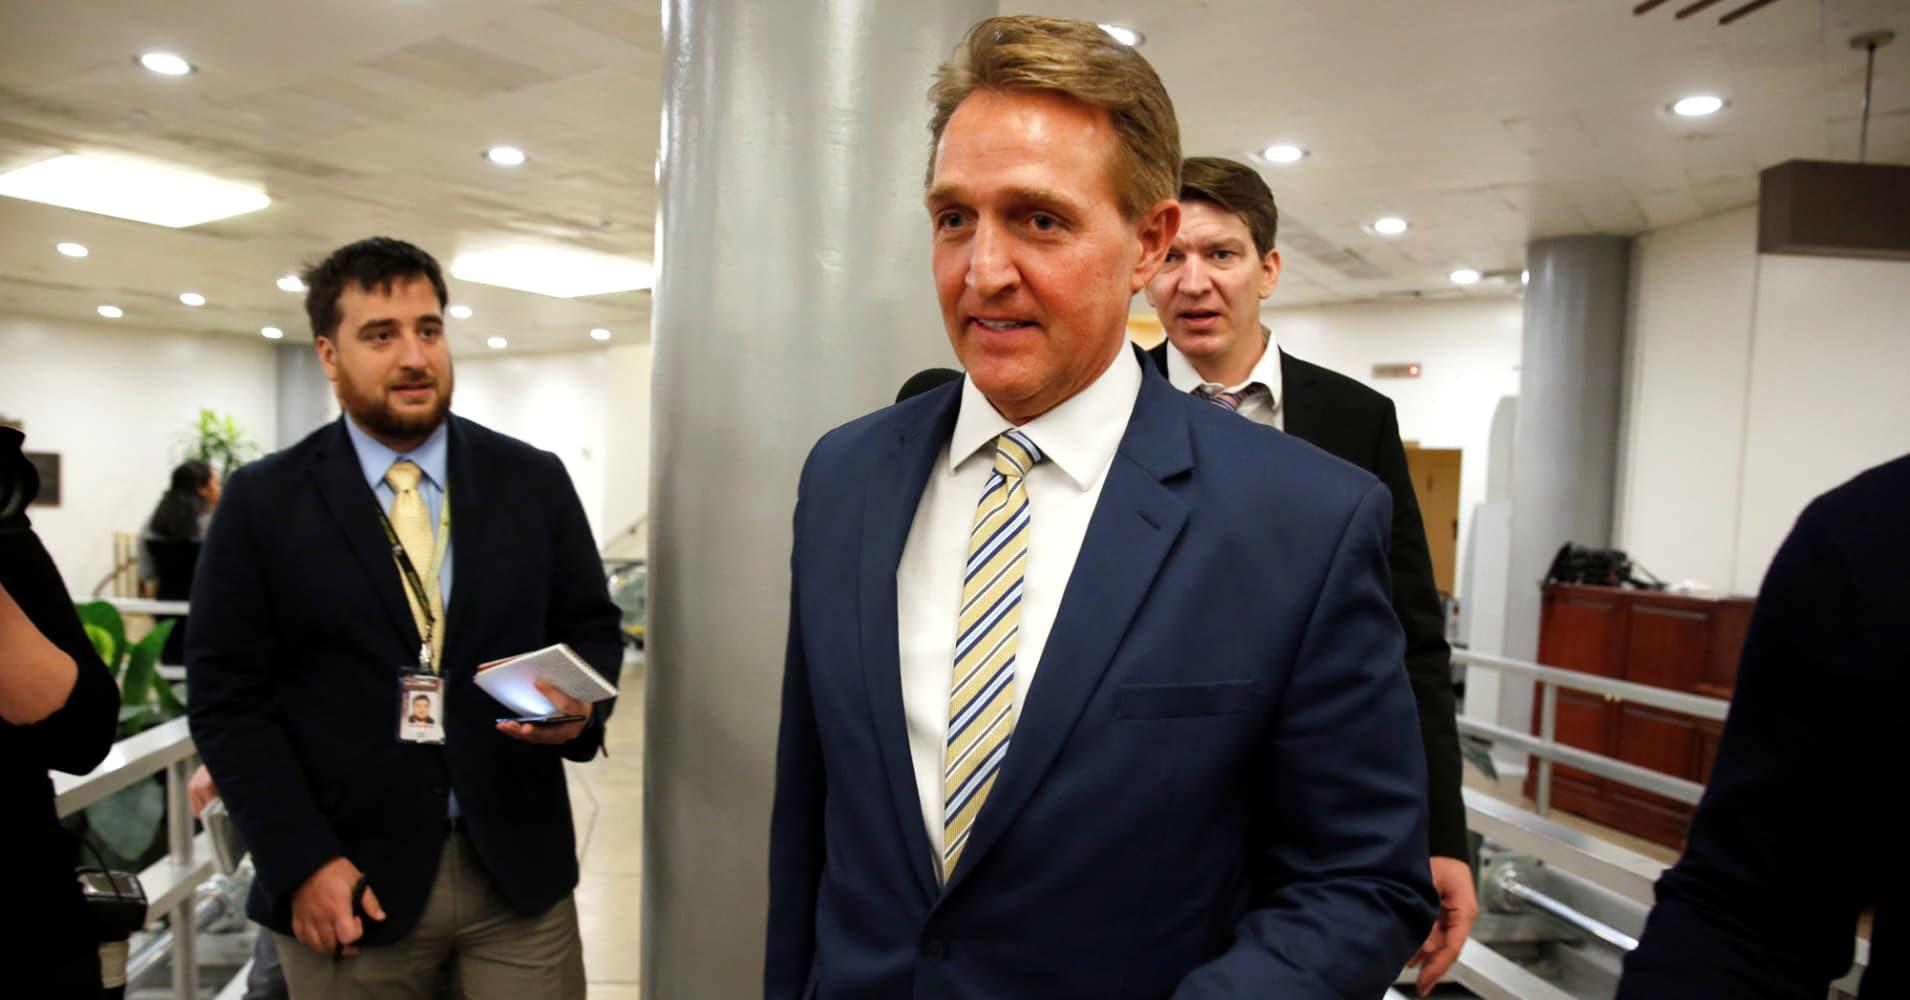 'The free press is the despot's enemy': Read Flake's Senate speech condemning Trump